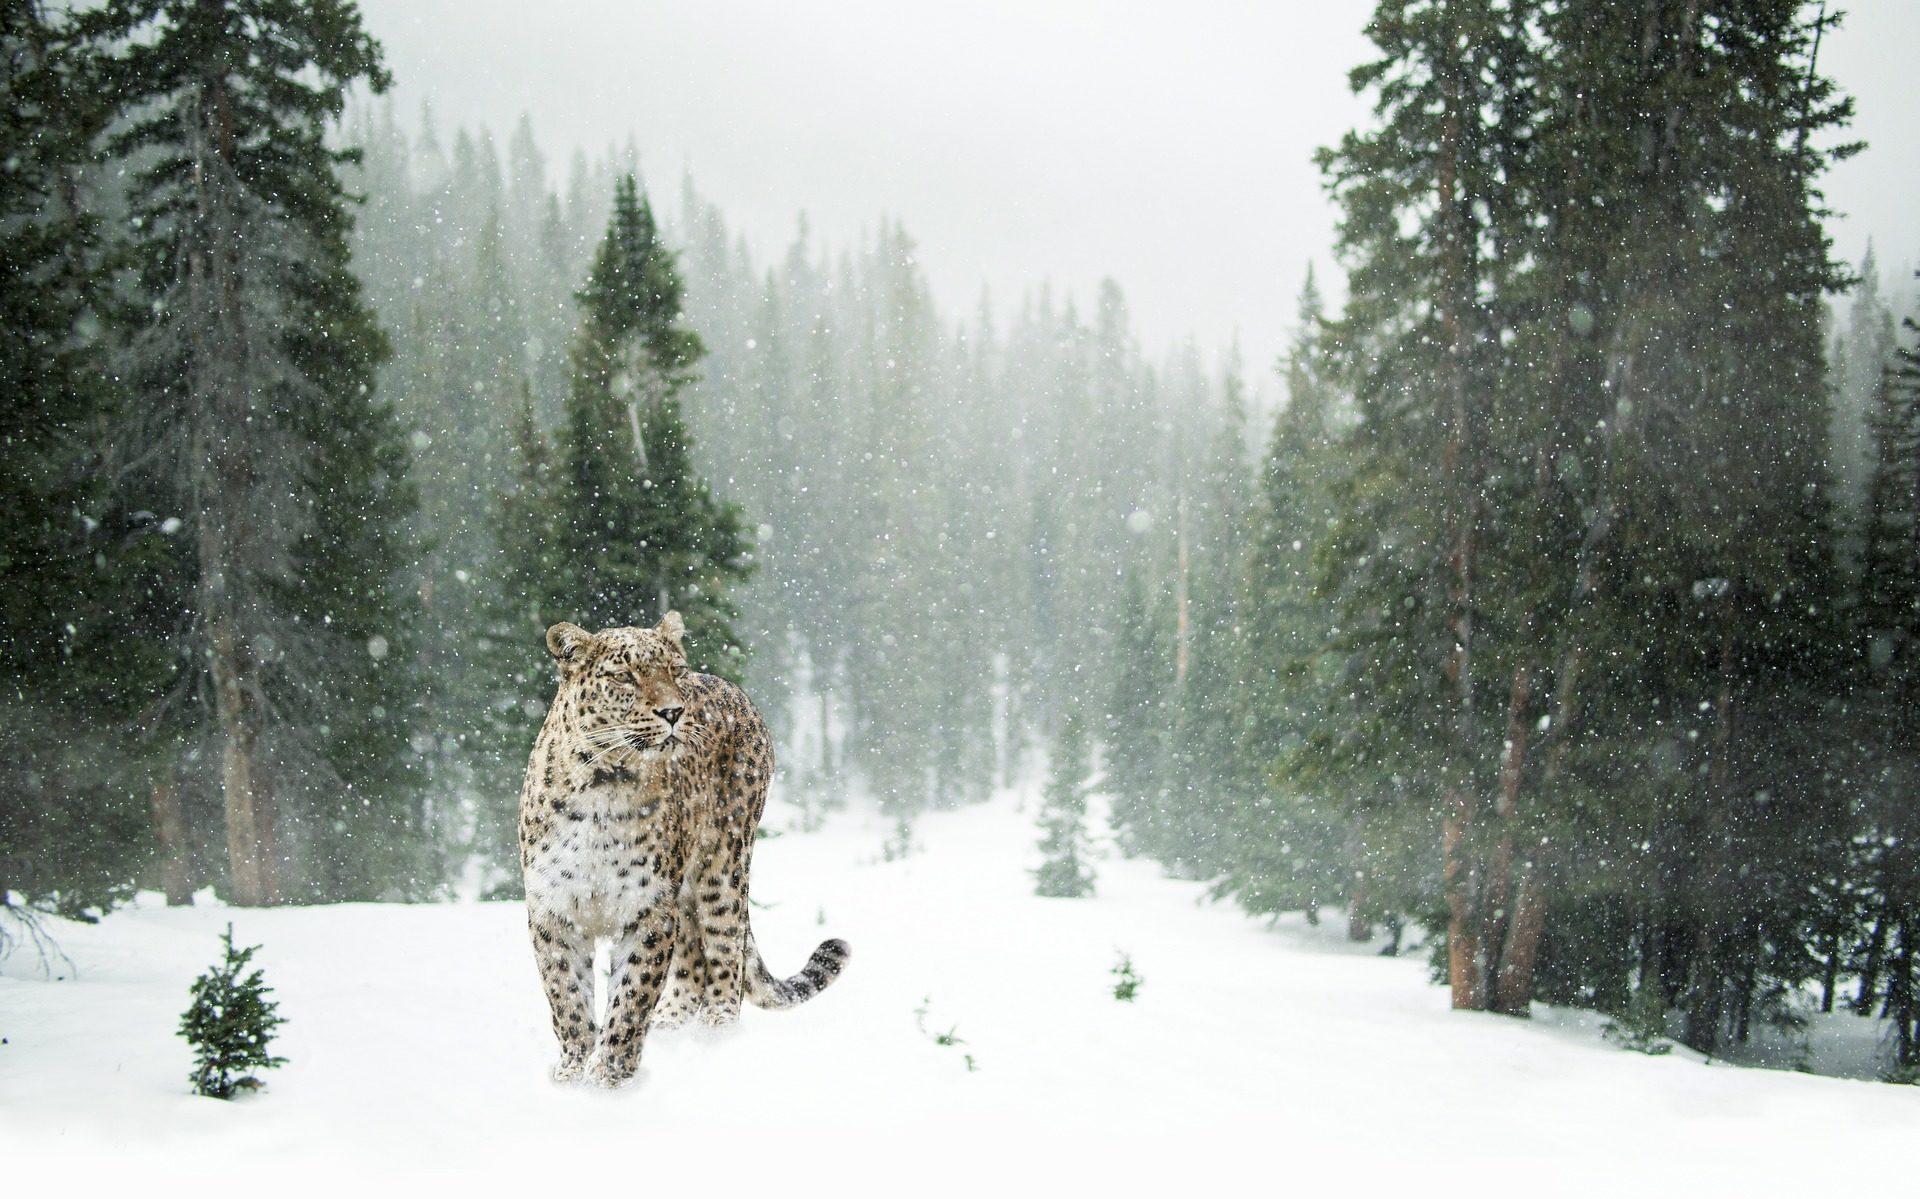 Leopard, Persa, neve, floresta, Selvagem, Nevada - Papéis de parede HD - Professor-falken.com